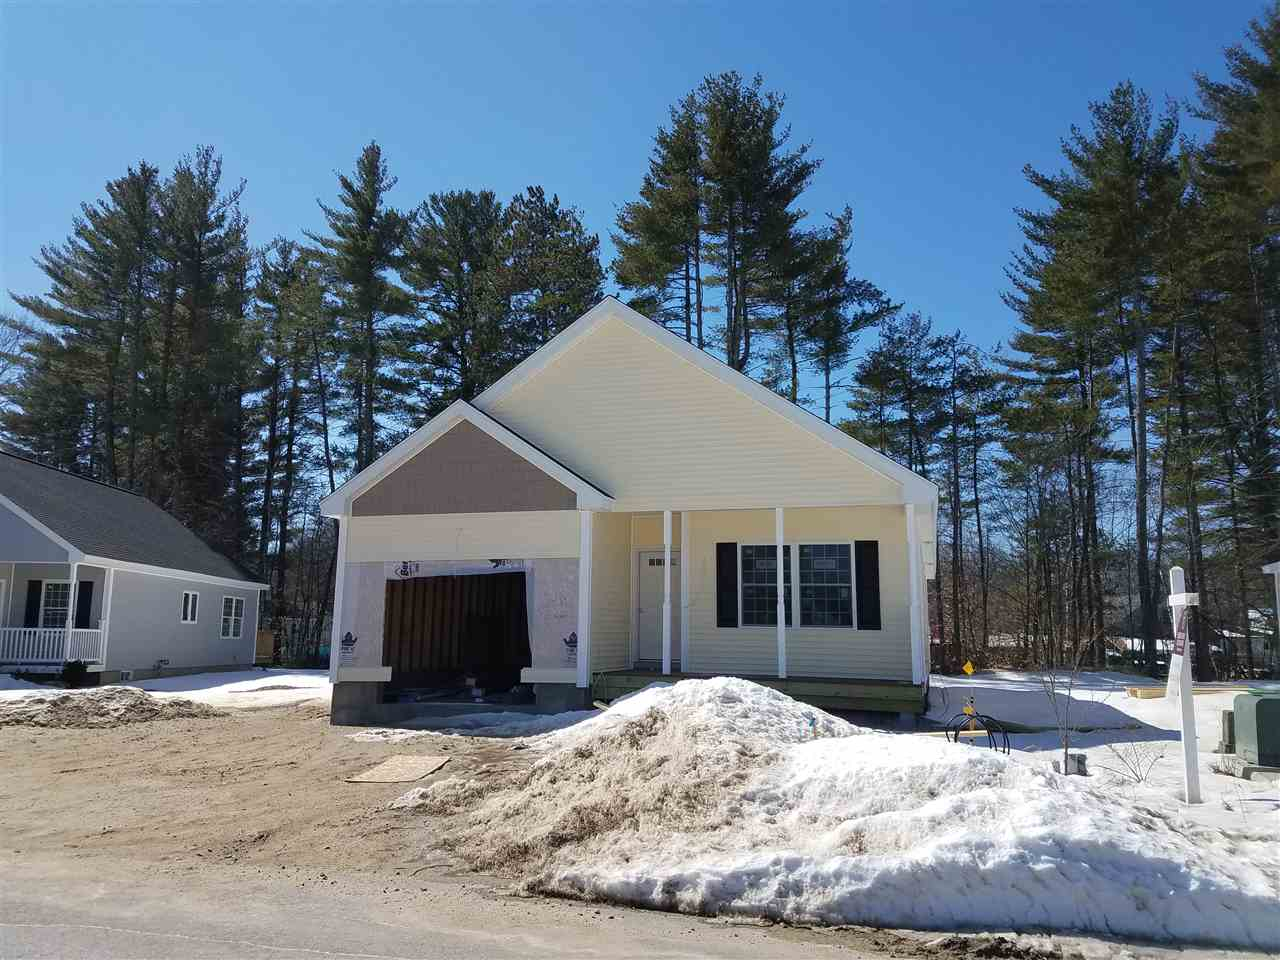 Real Estate for Sale, ListingId: 34503302, Concord,NH03303